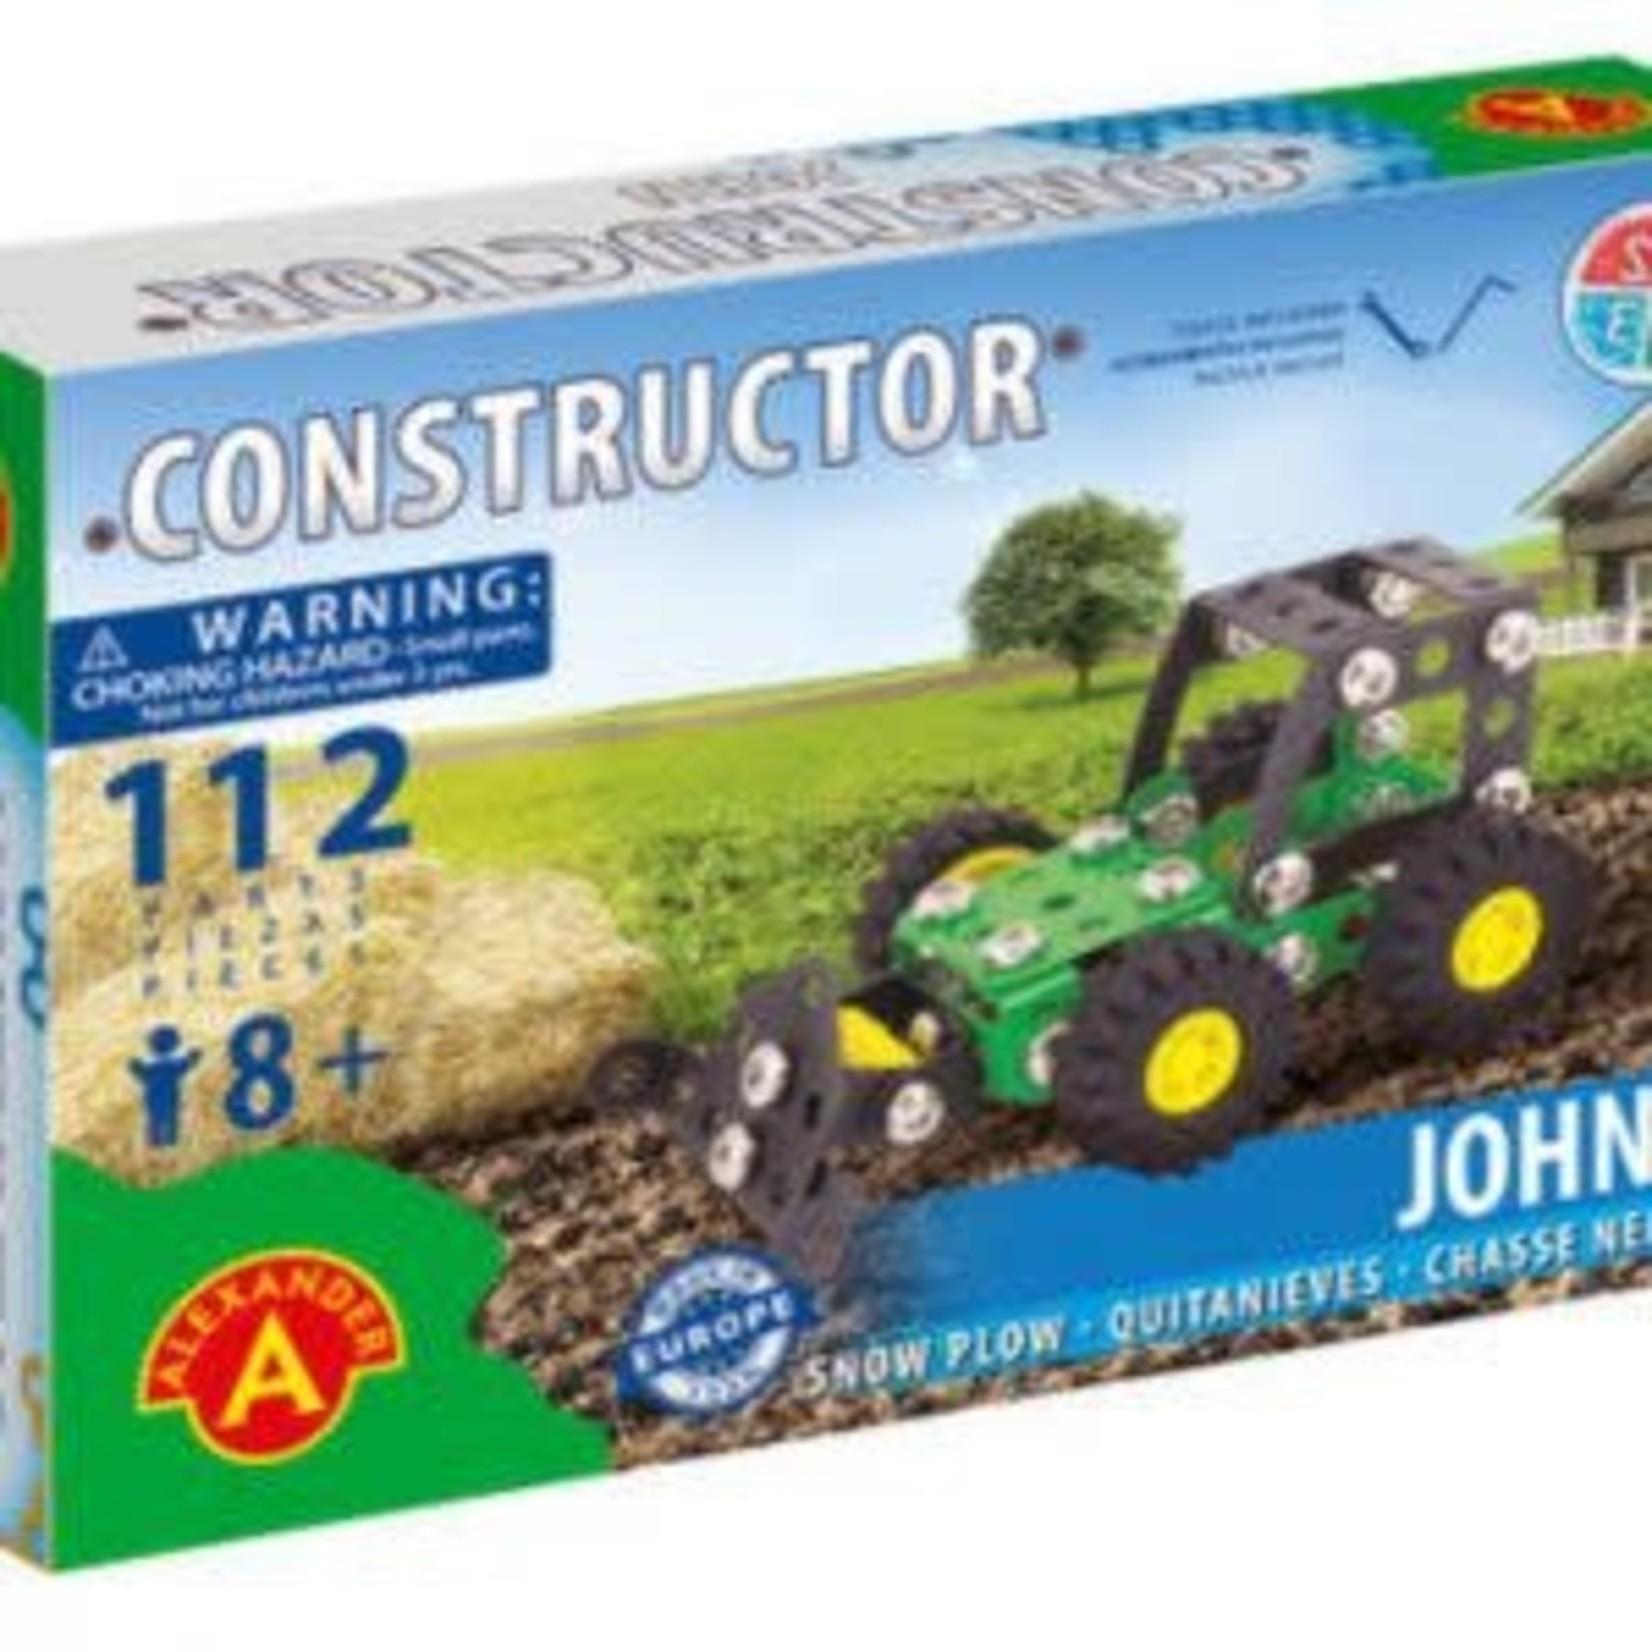 Alexander Constructor John Snow Plow